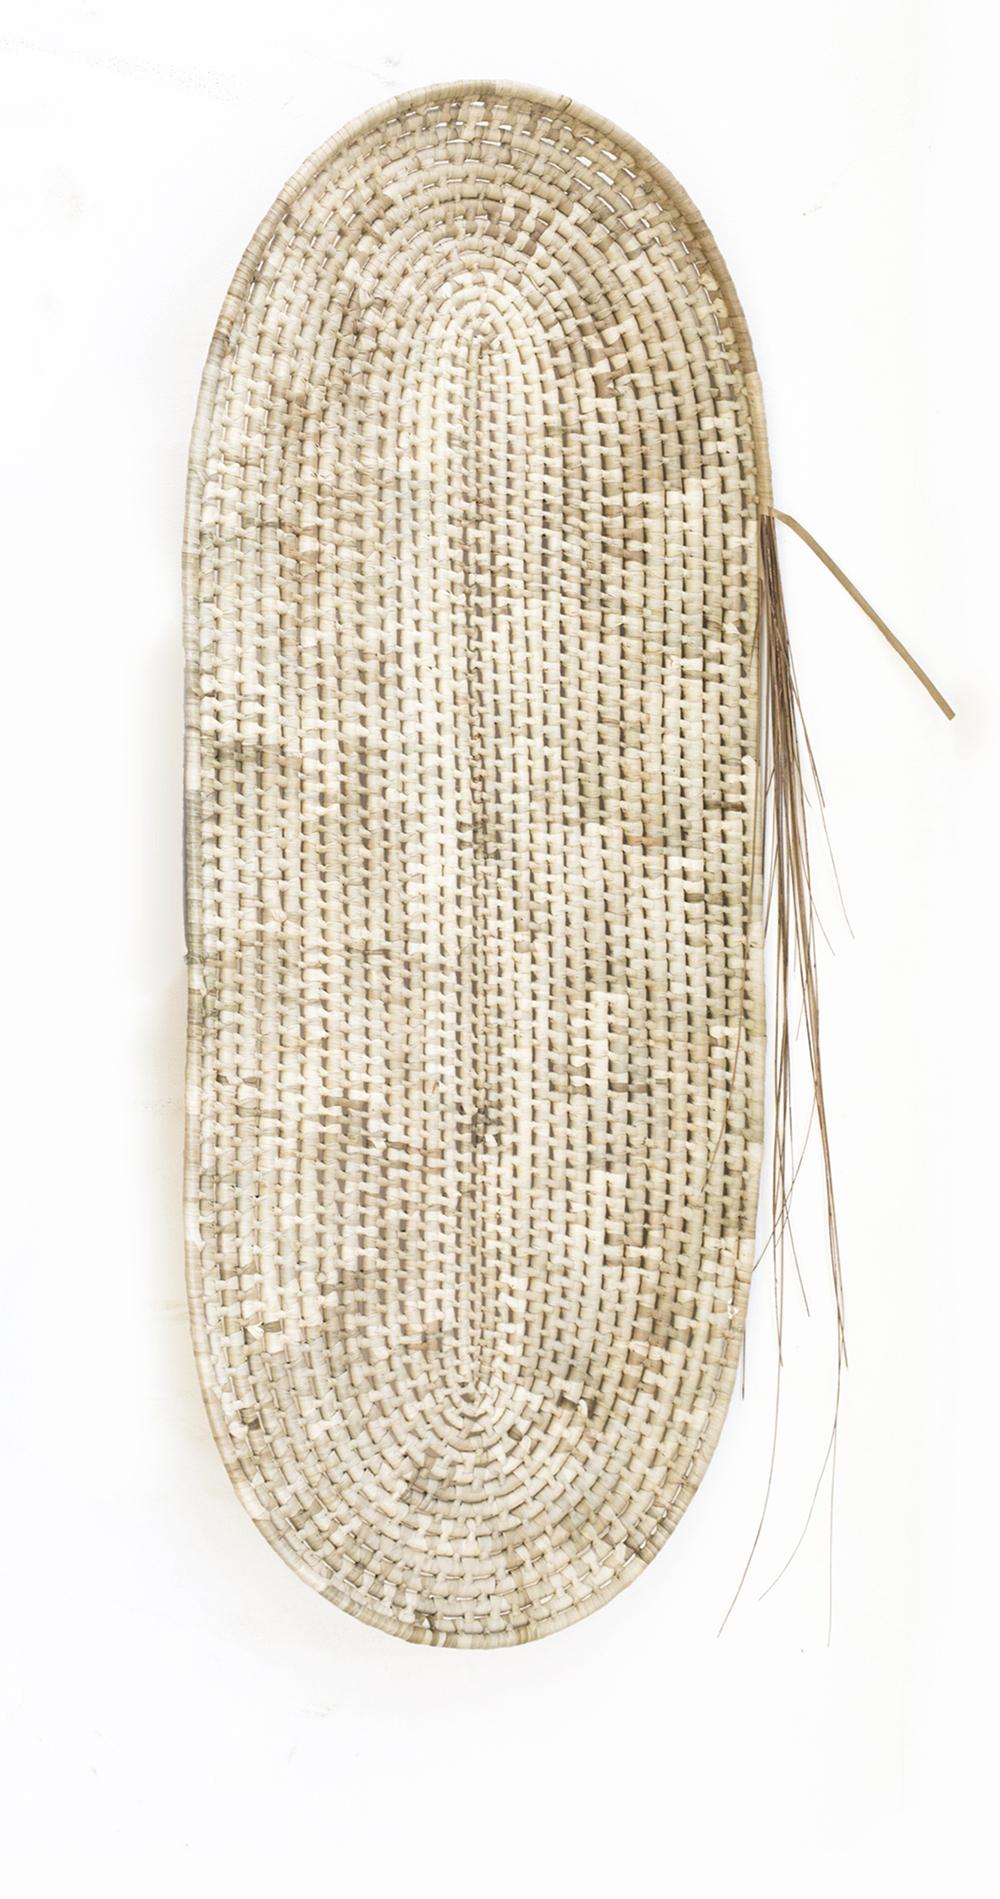 Mangaliliu